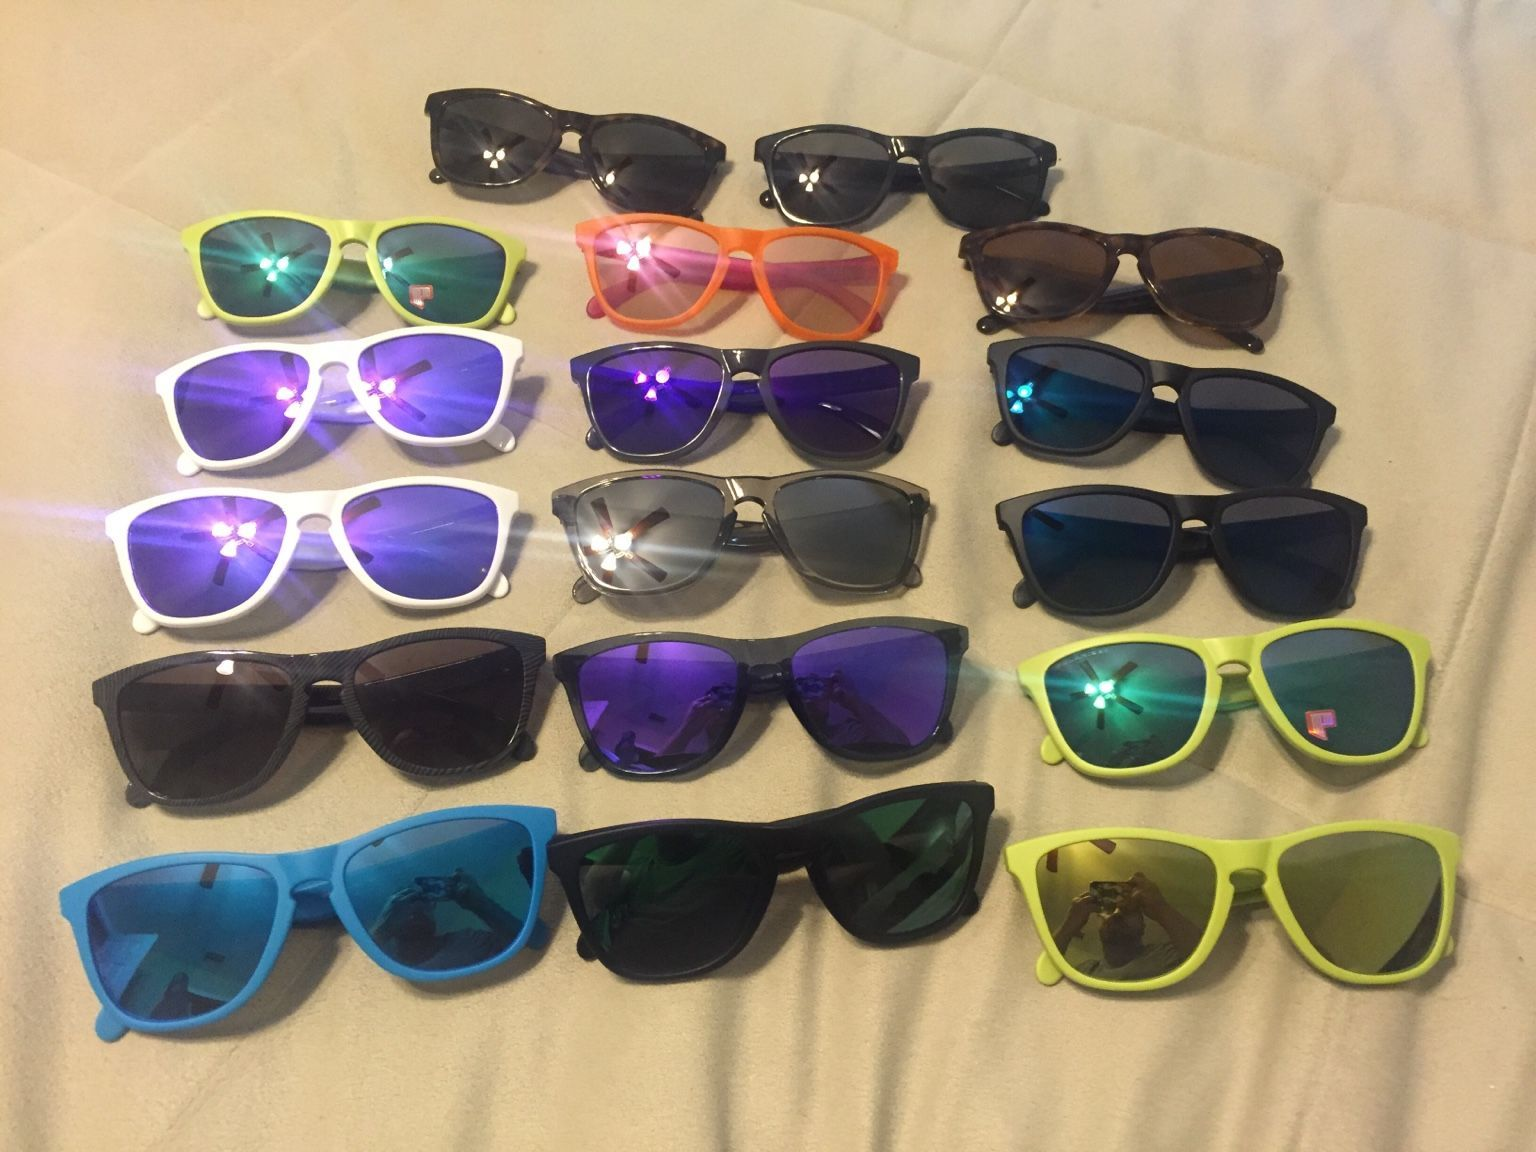 Many frames!!! EVEN LOWER!!!! Price drop!!!! - 82e9840f71028101e55342e7a435ee7b.jpg